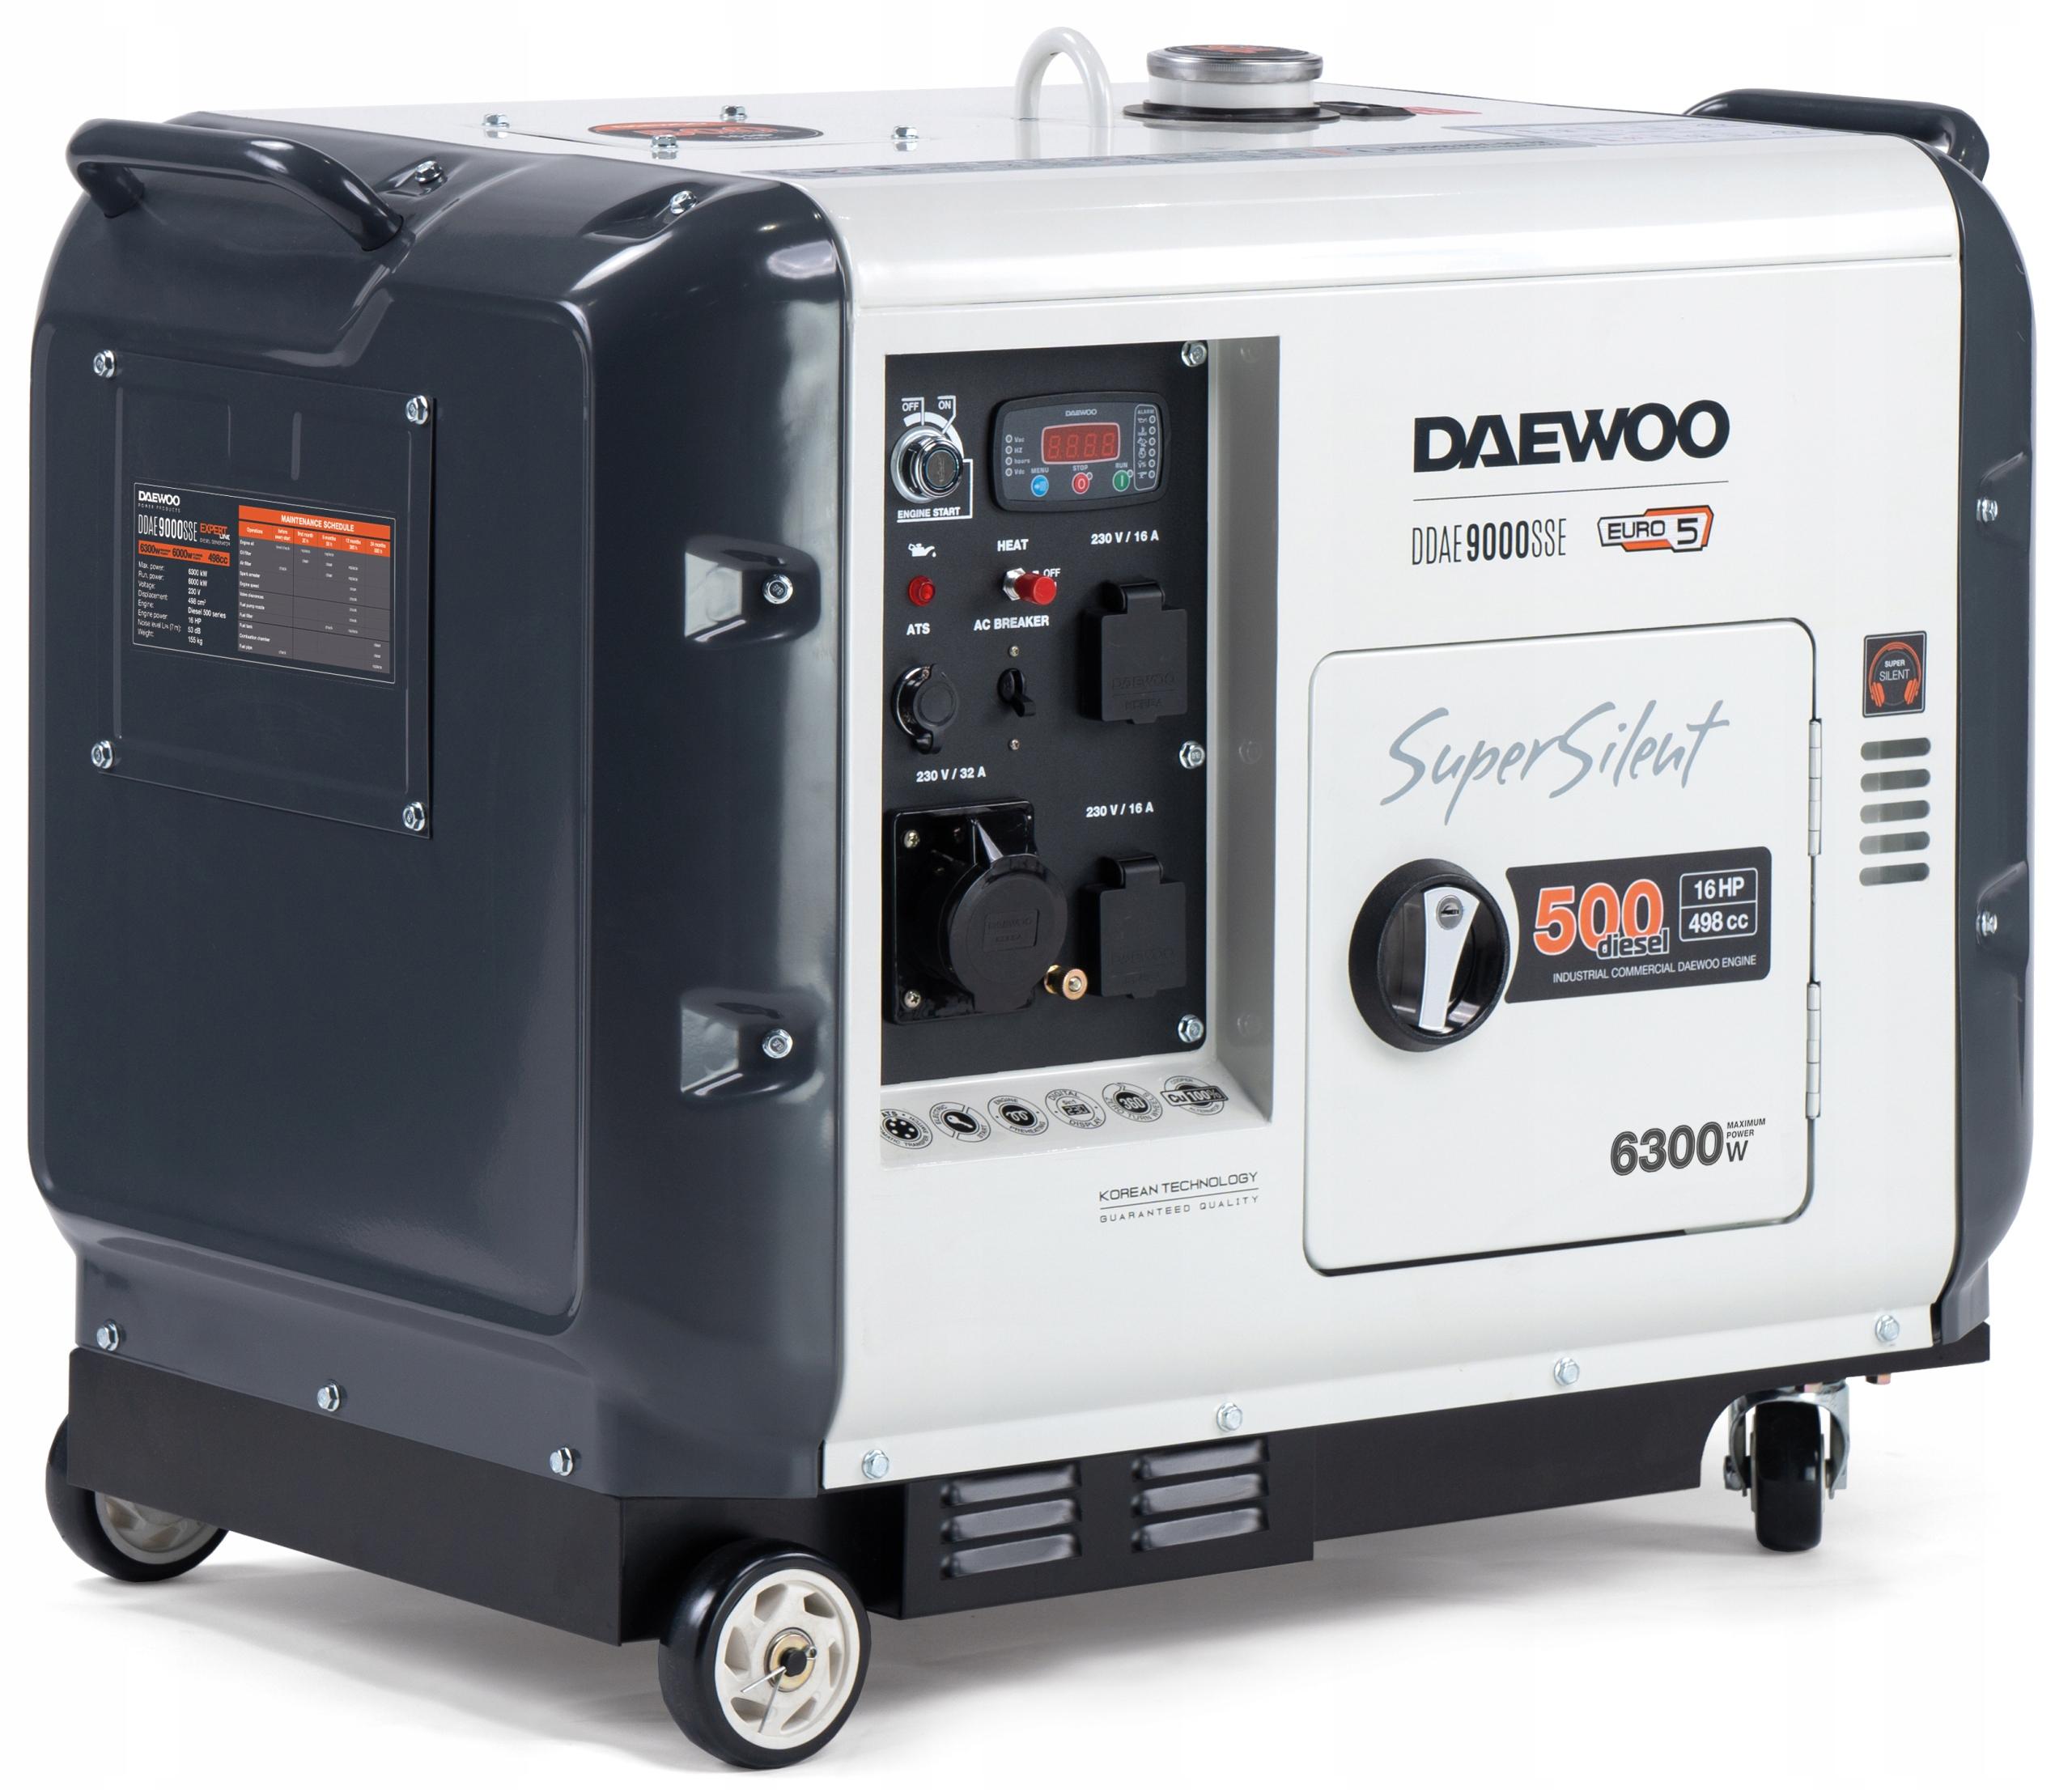 DAEWOO DDAE 9000SSE Дизель-генераторная установка